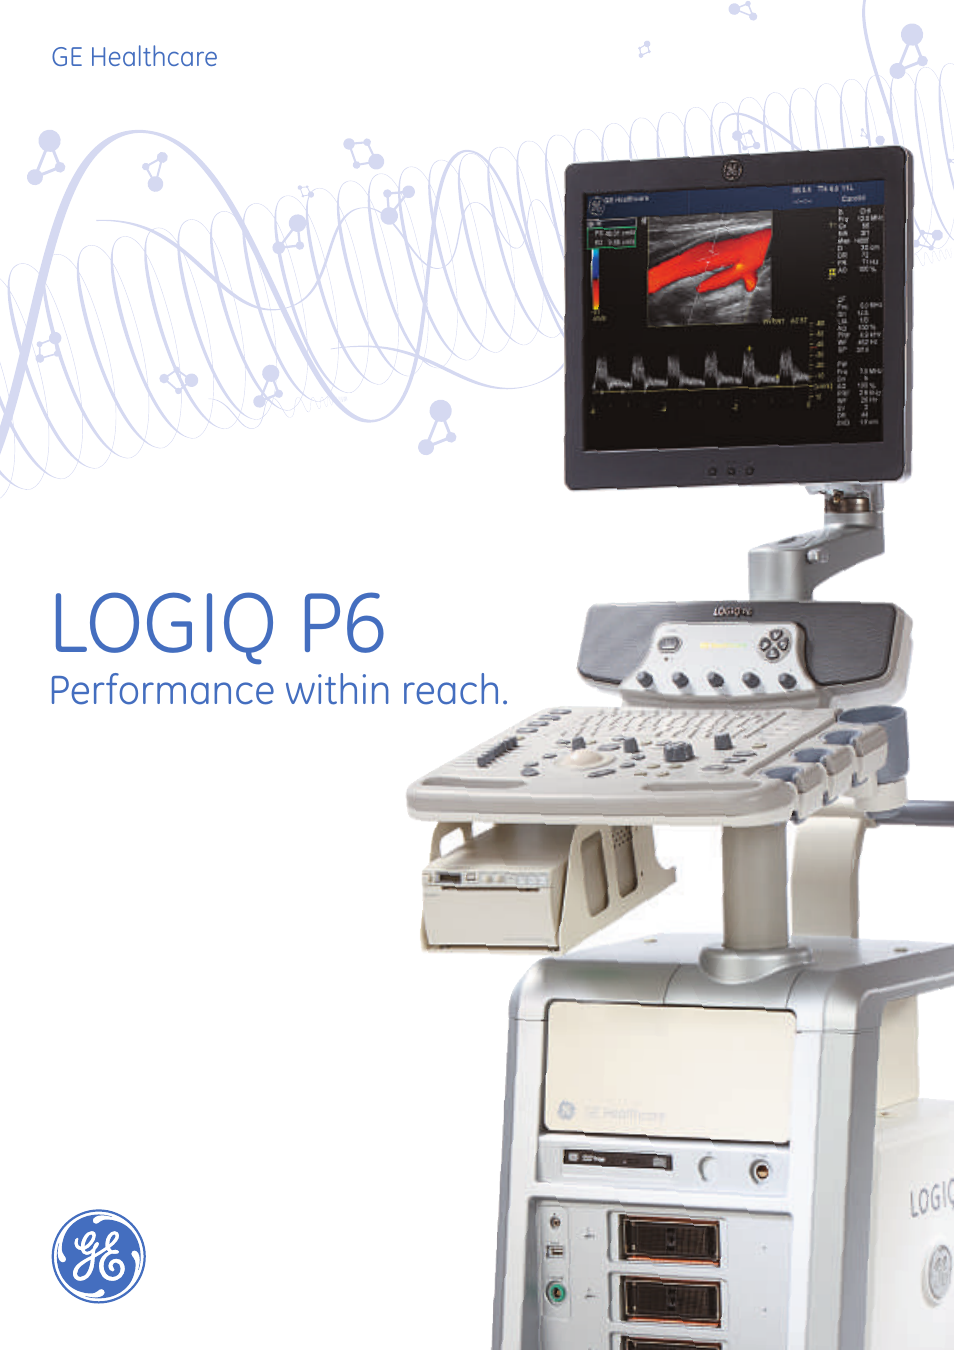 logiq i manual open source user manual u2022 rh dramatic varieties com Logiq 9 System GE Logiq P5